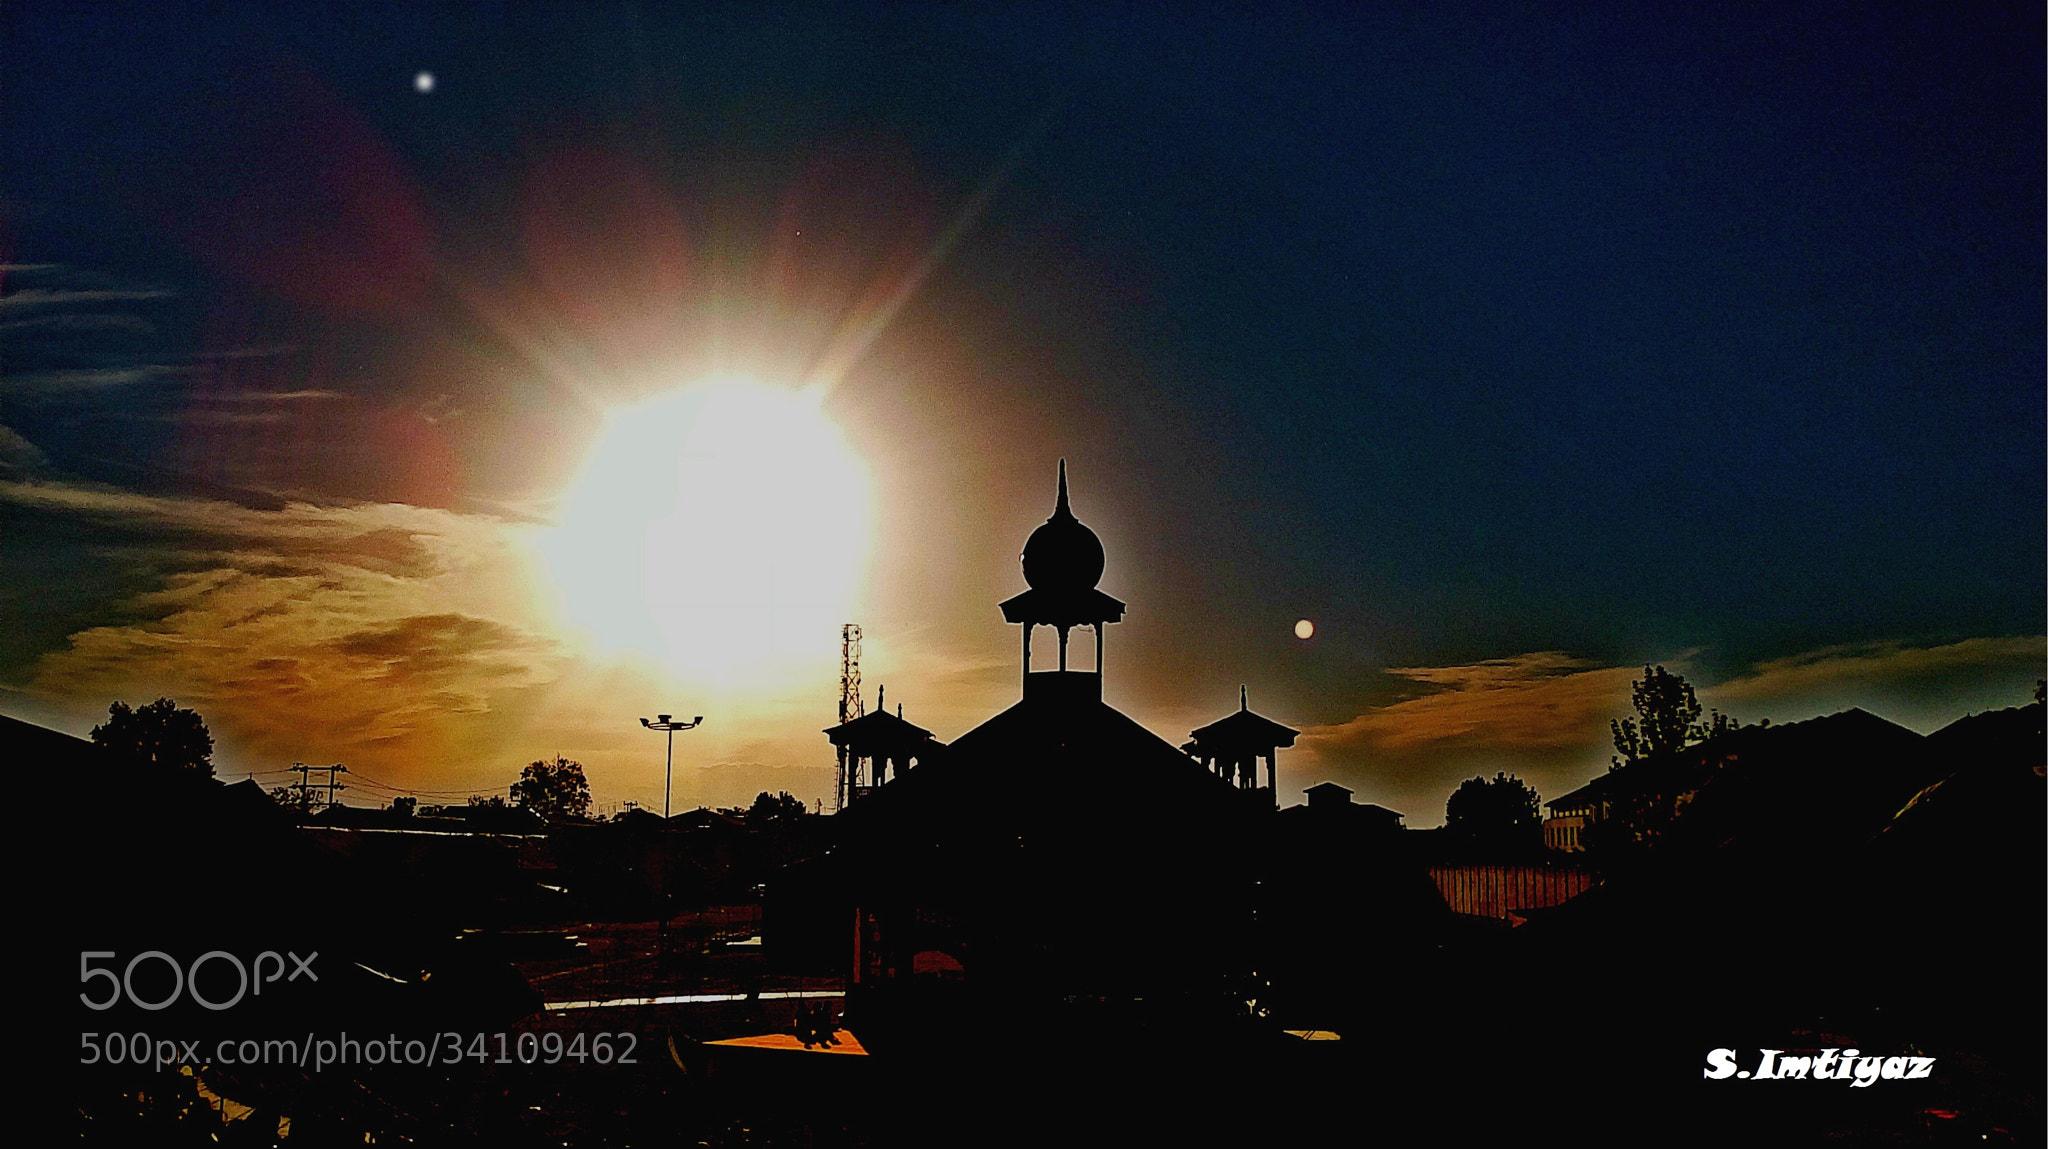 Photograph Exuberant Kashmir by Sheikh Imtiyaz on 500px